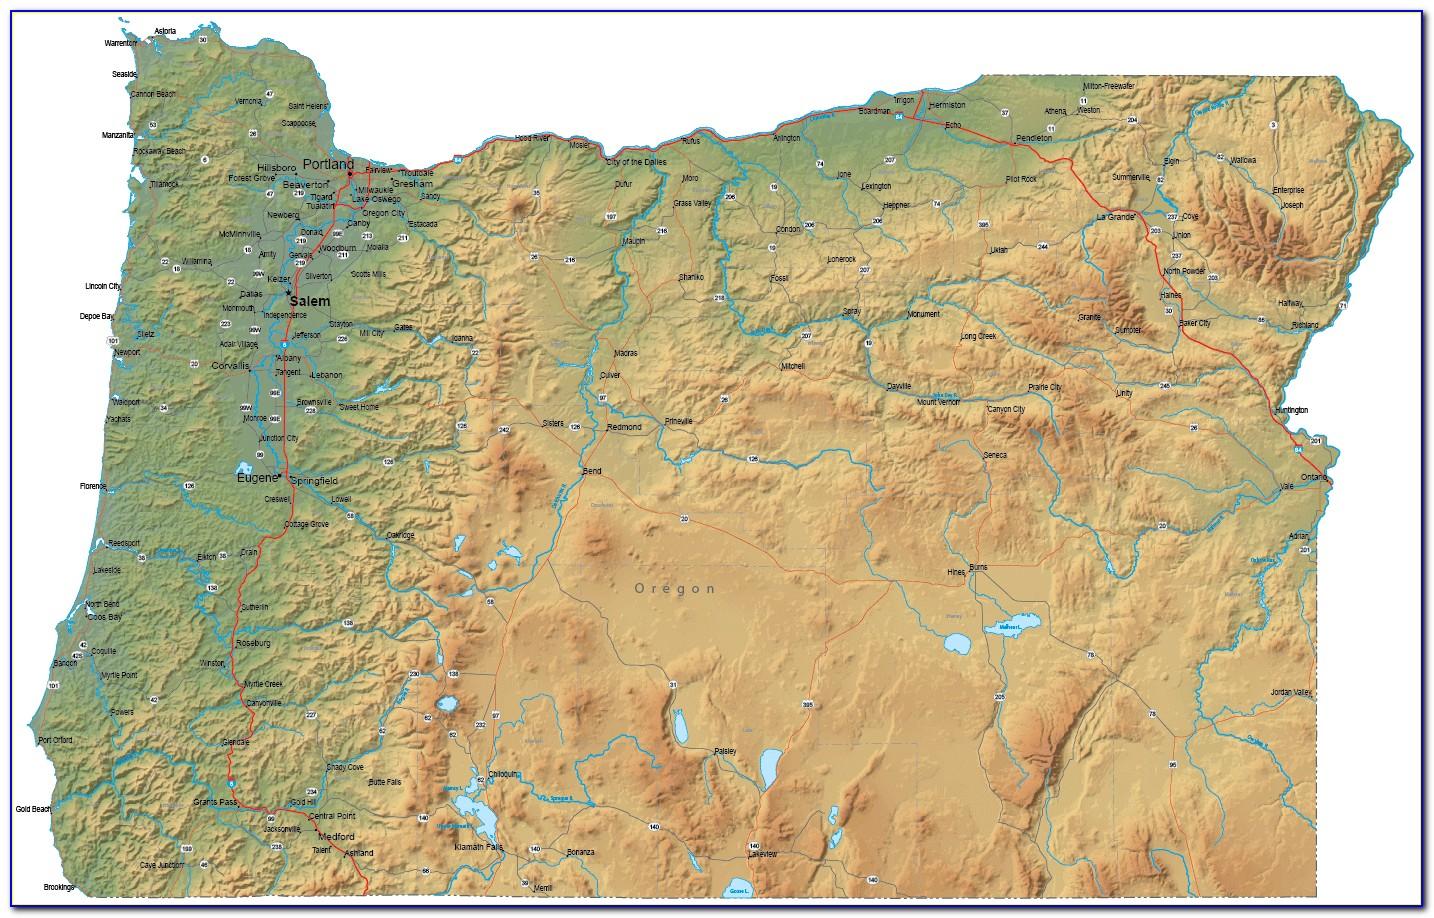 Topo Map Of Oregon